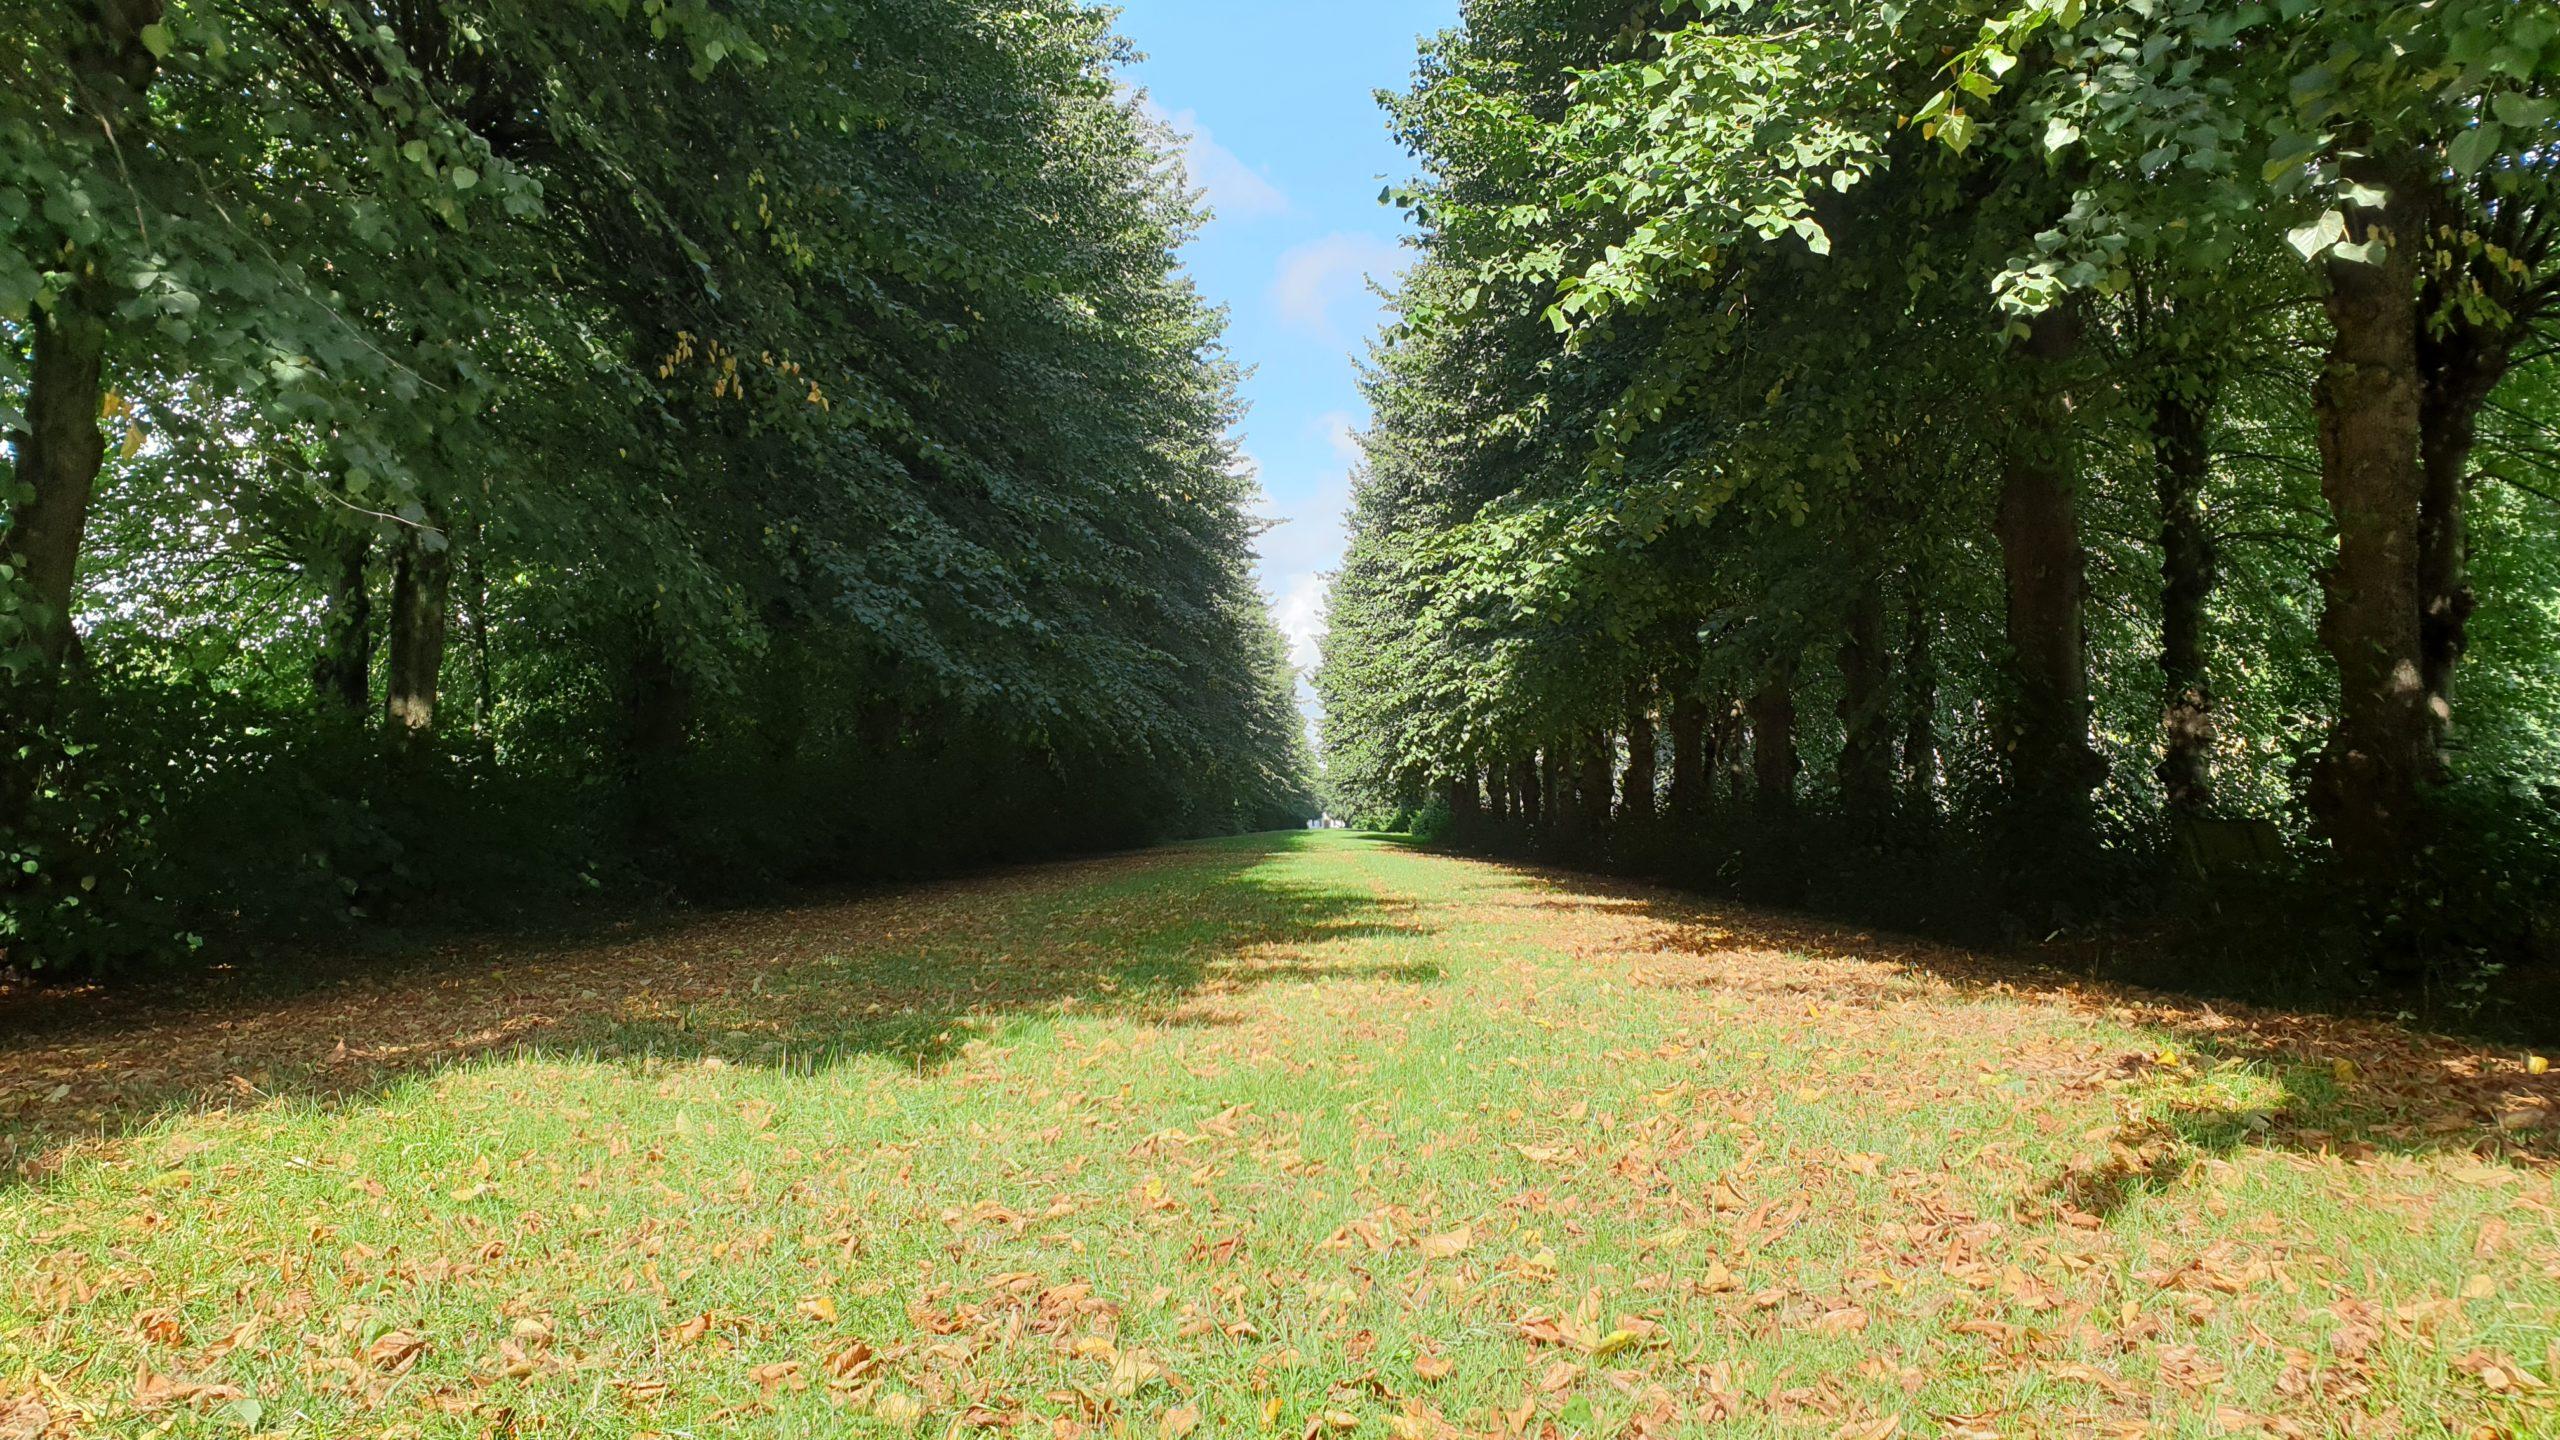 Lime tree avenue in Seestermühe